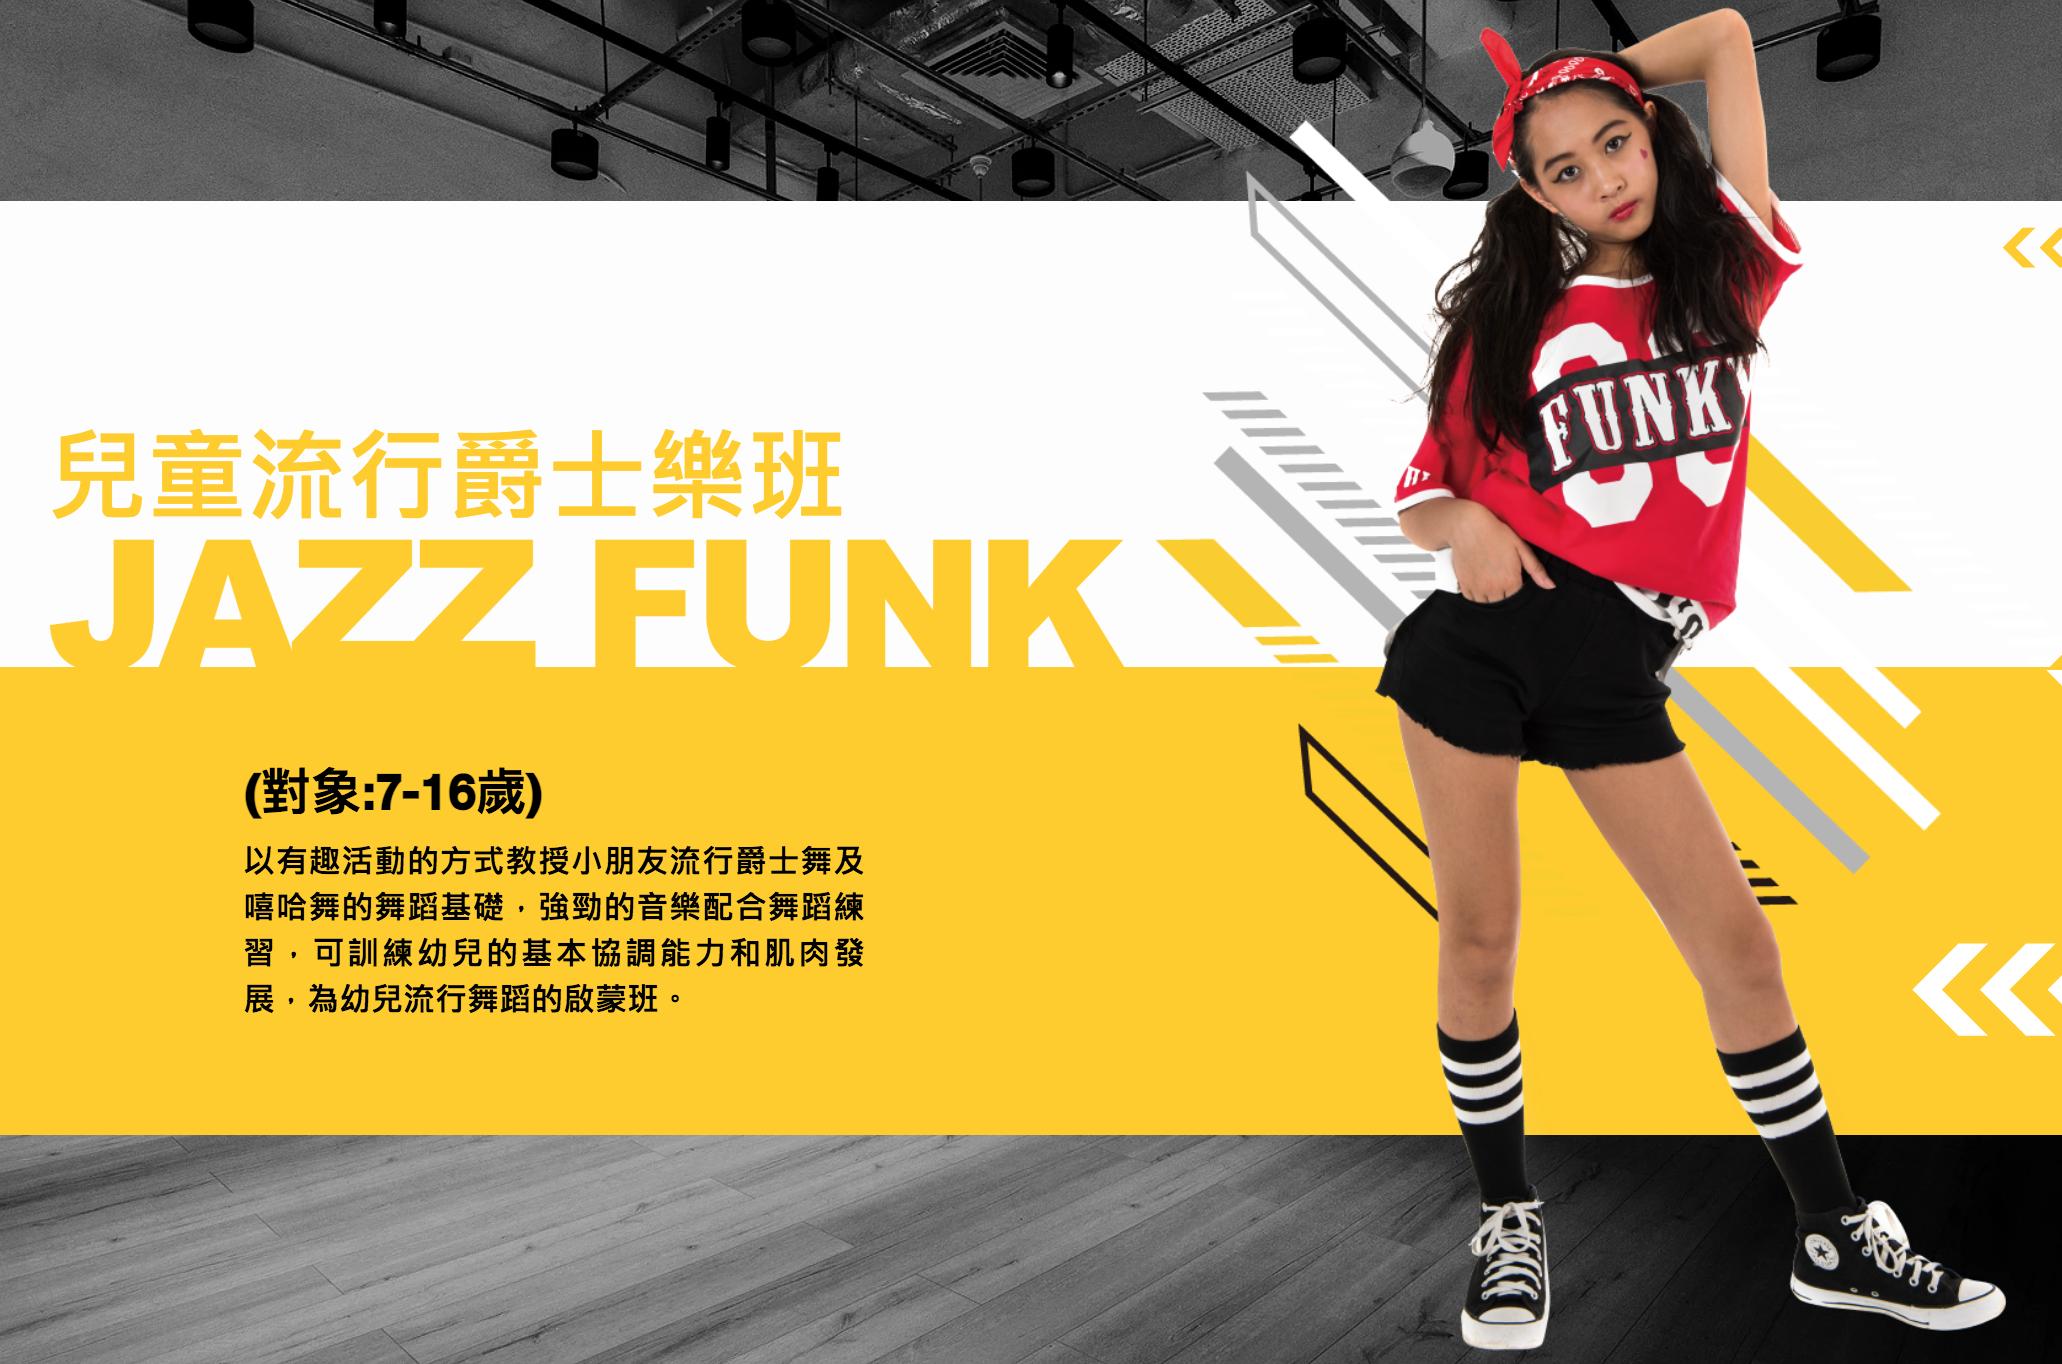 Jazz Funk Class